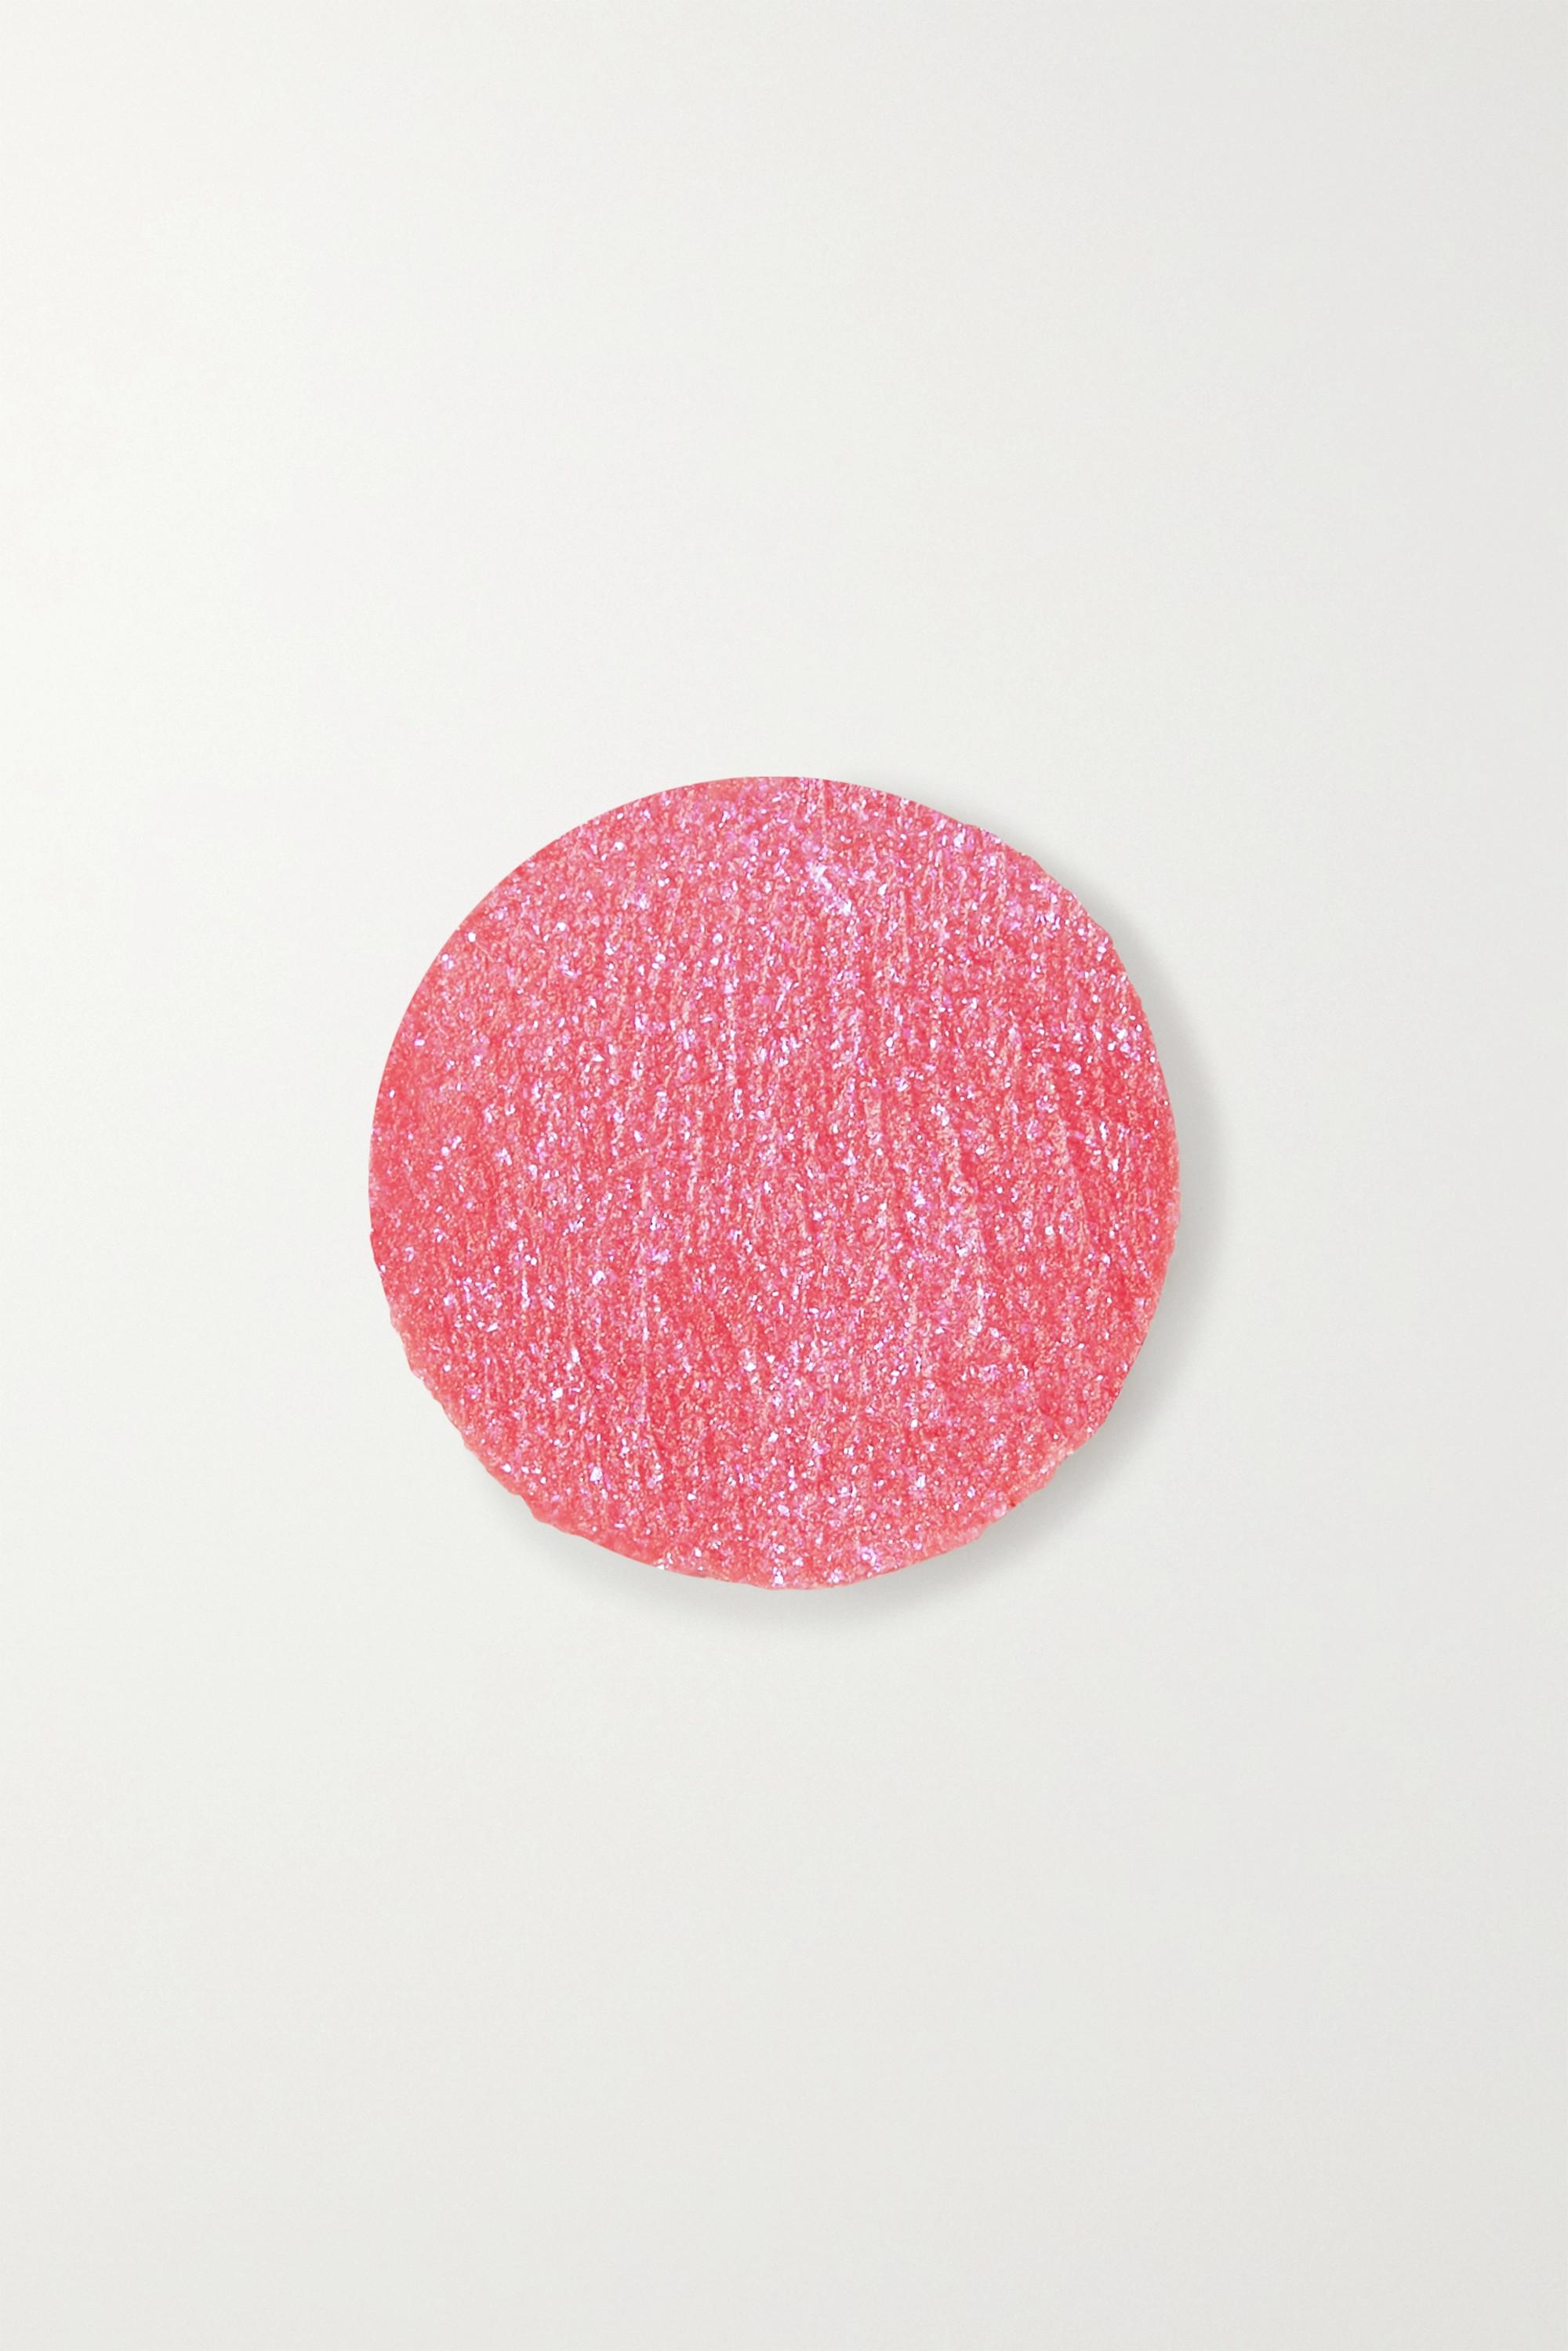 Pat McGrath Labs Lip Fetish Astral Lip Balm - VR Pink